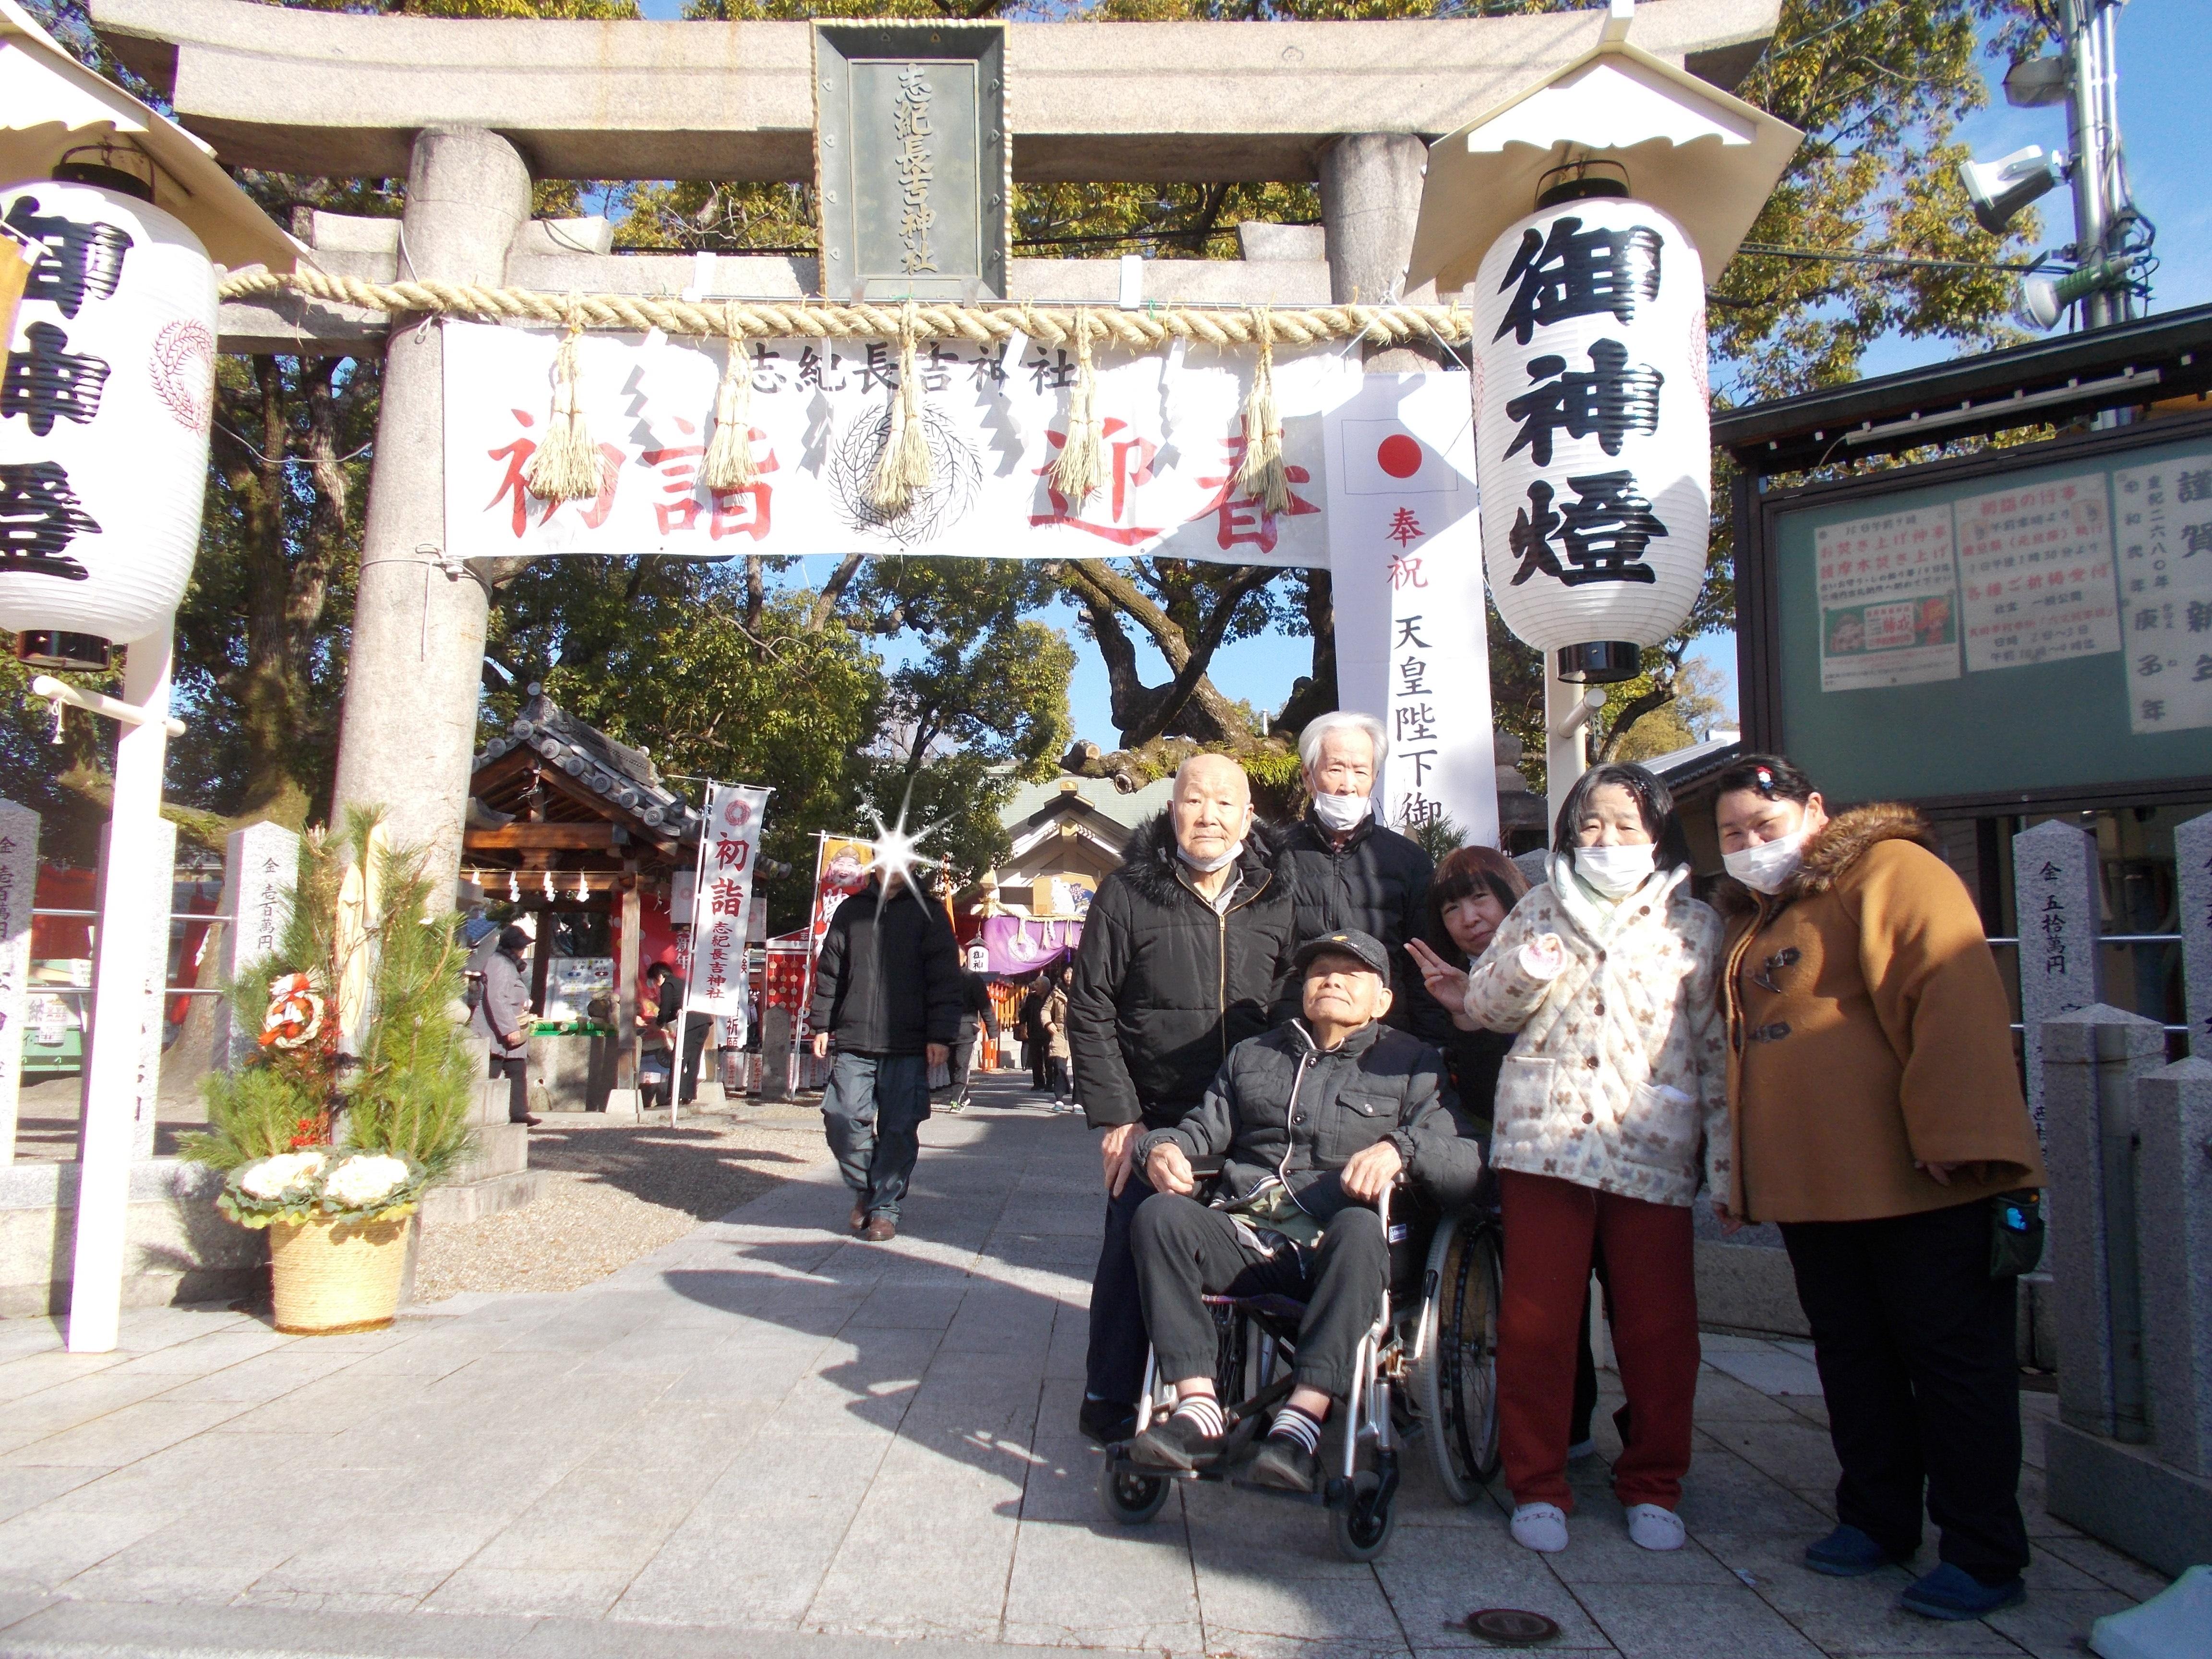 http://www.supercourt.jp/blog/hirano/202001018.JPG